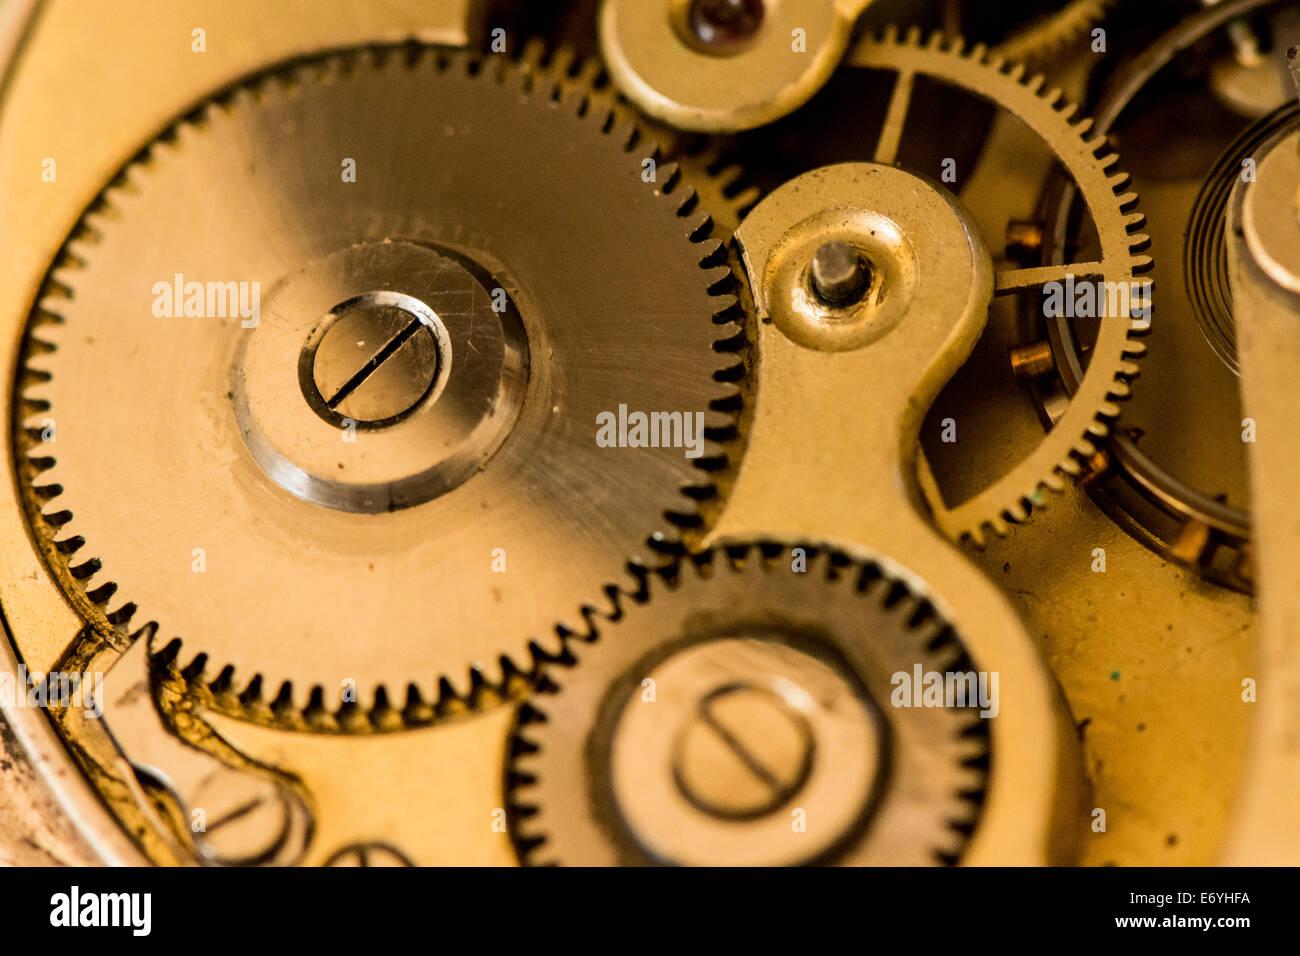 inside a vintage pocket watch - Stock Image